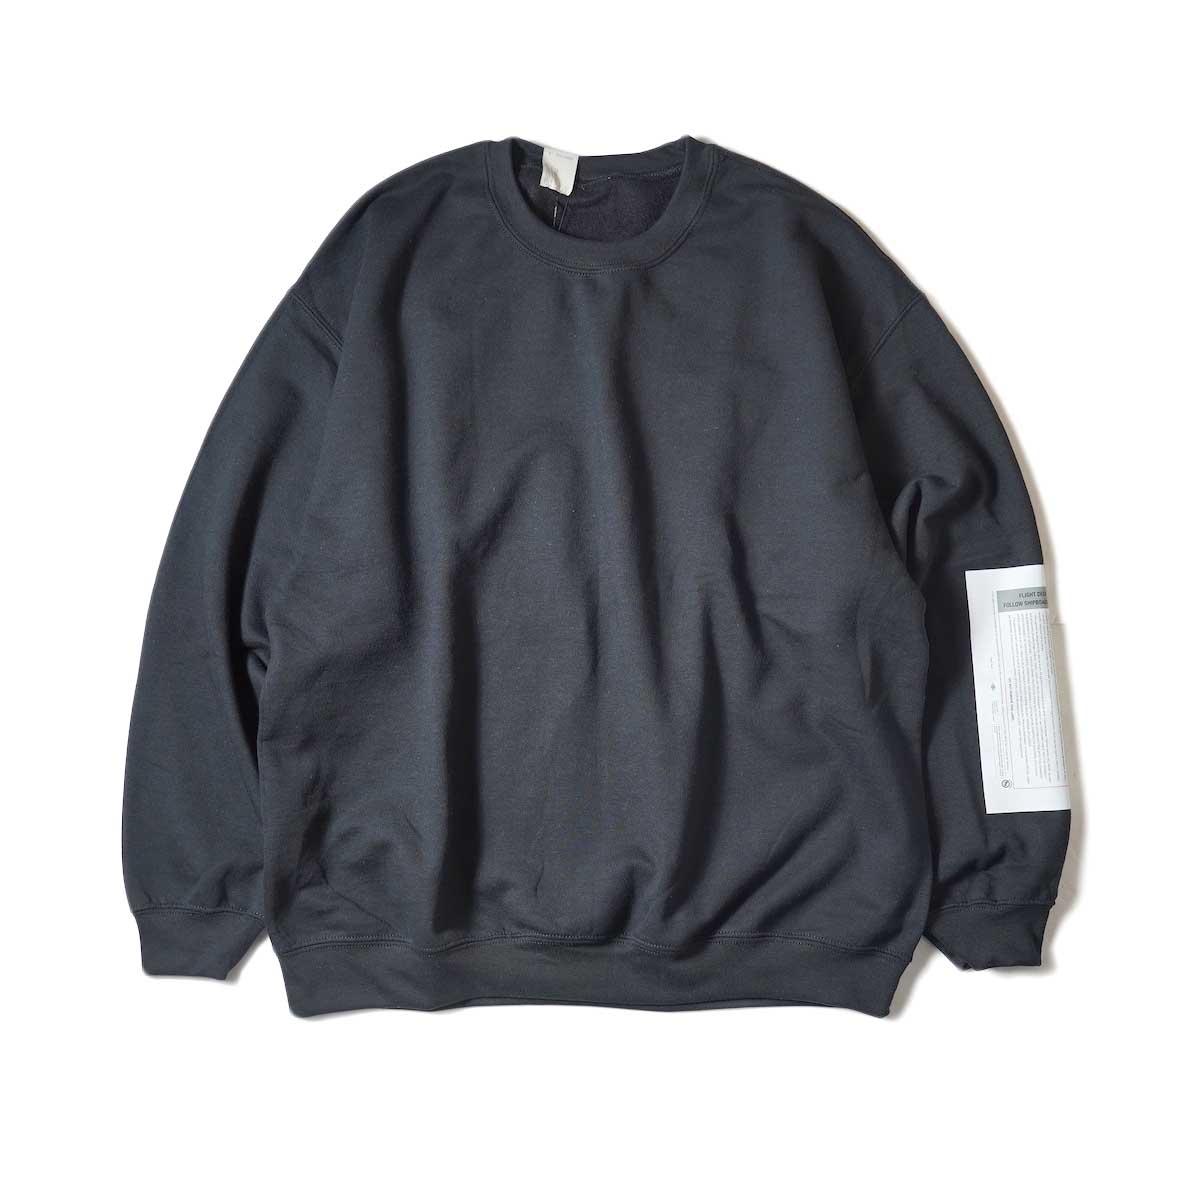 N.HOOLYWOOD / 9212-CS85 Crew Neck Sweat Shirt (Black)